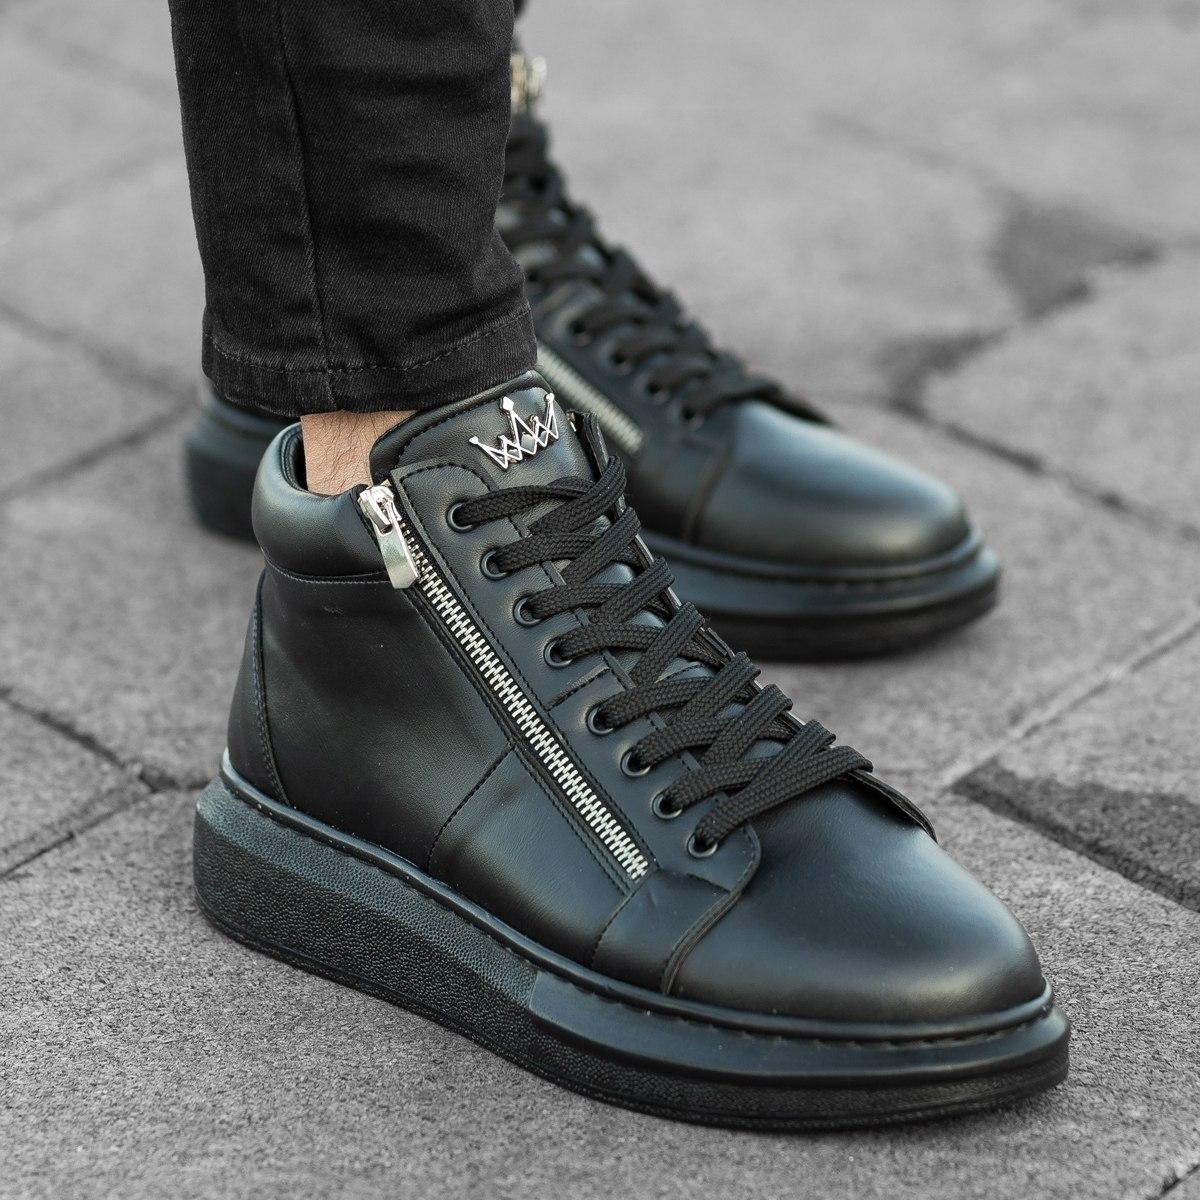 Homem Cano Alto Sneakers Designer Zip Basket Preto